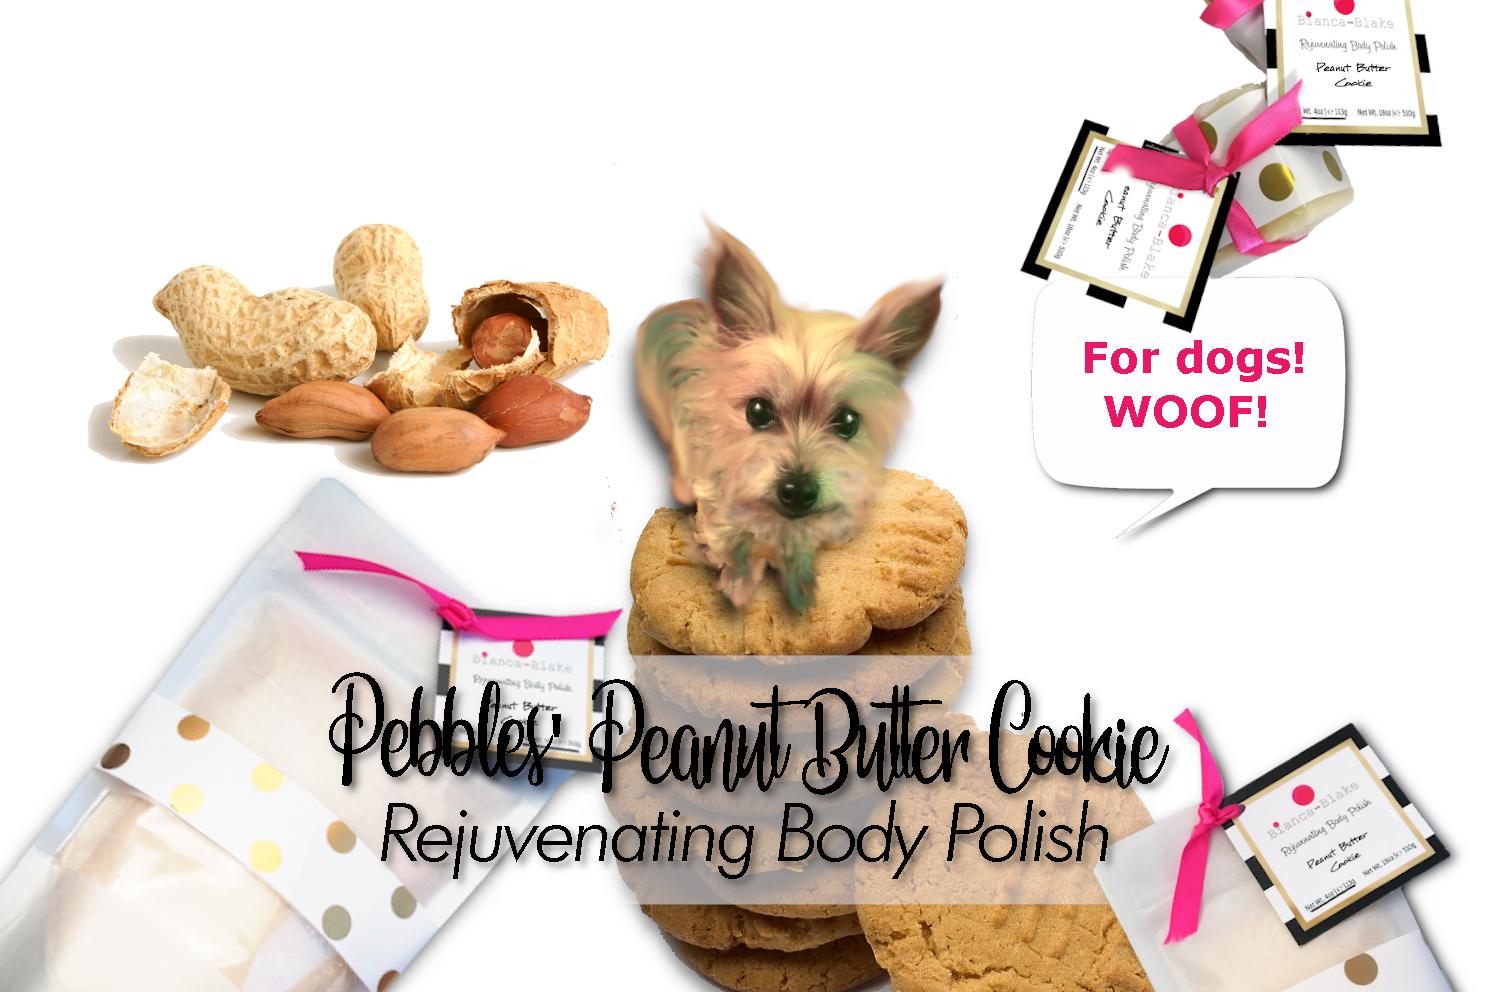 Pebbles' Peanut Butter Cookie Body Polish